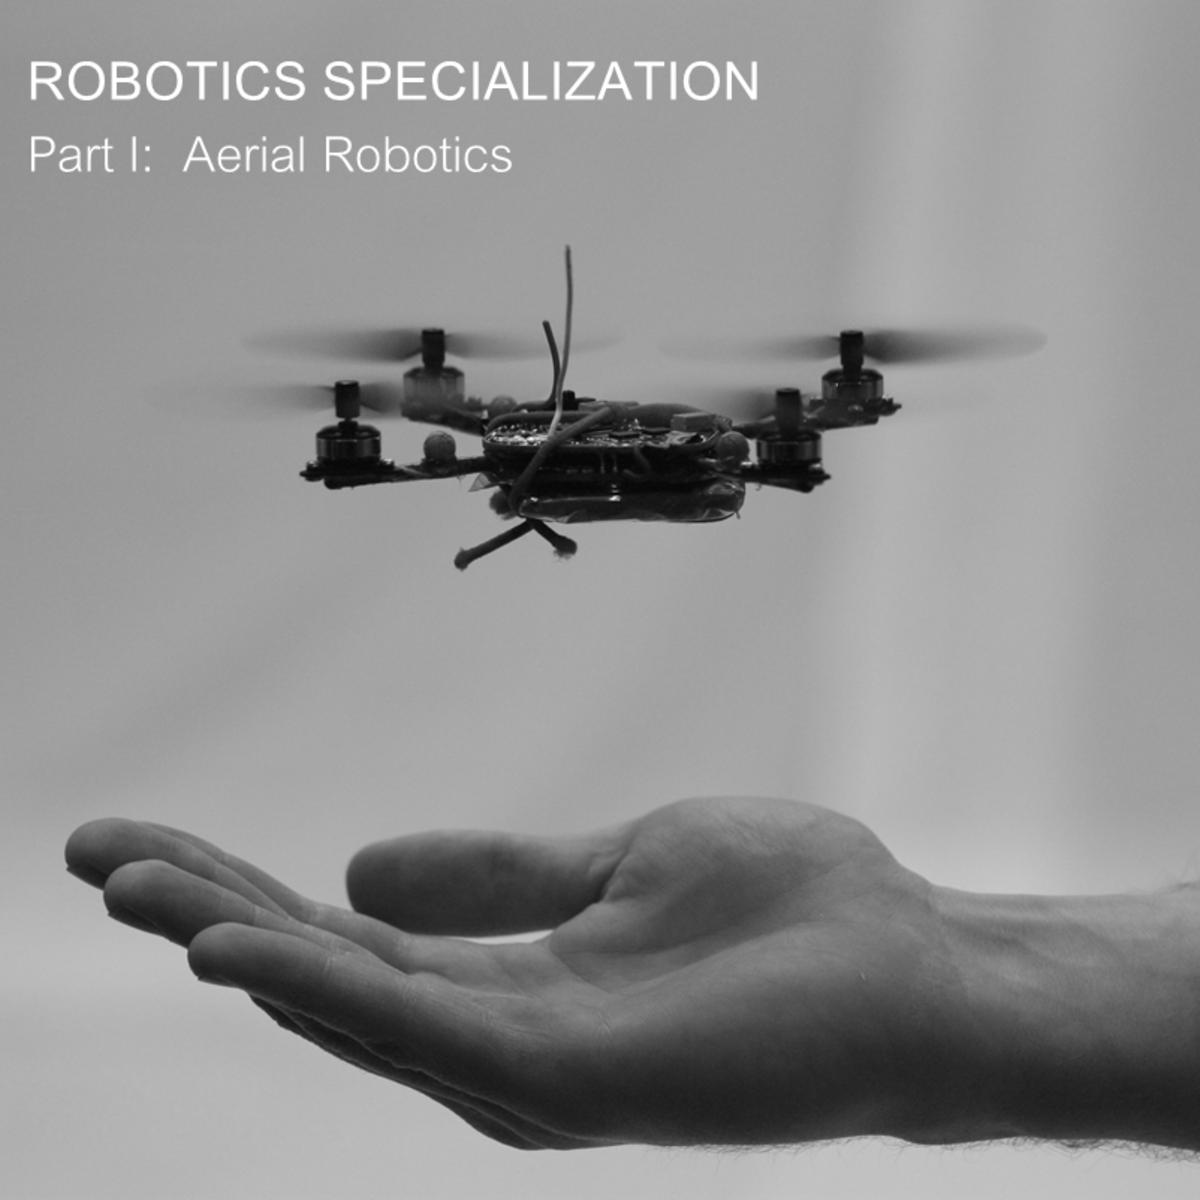 Robotics: Aerial Robotics